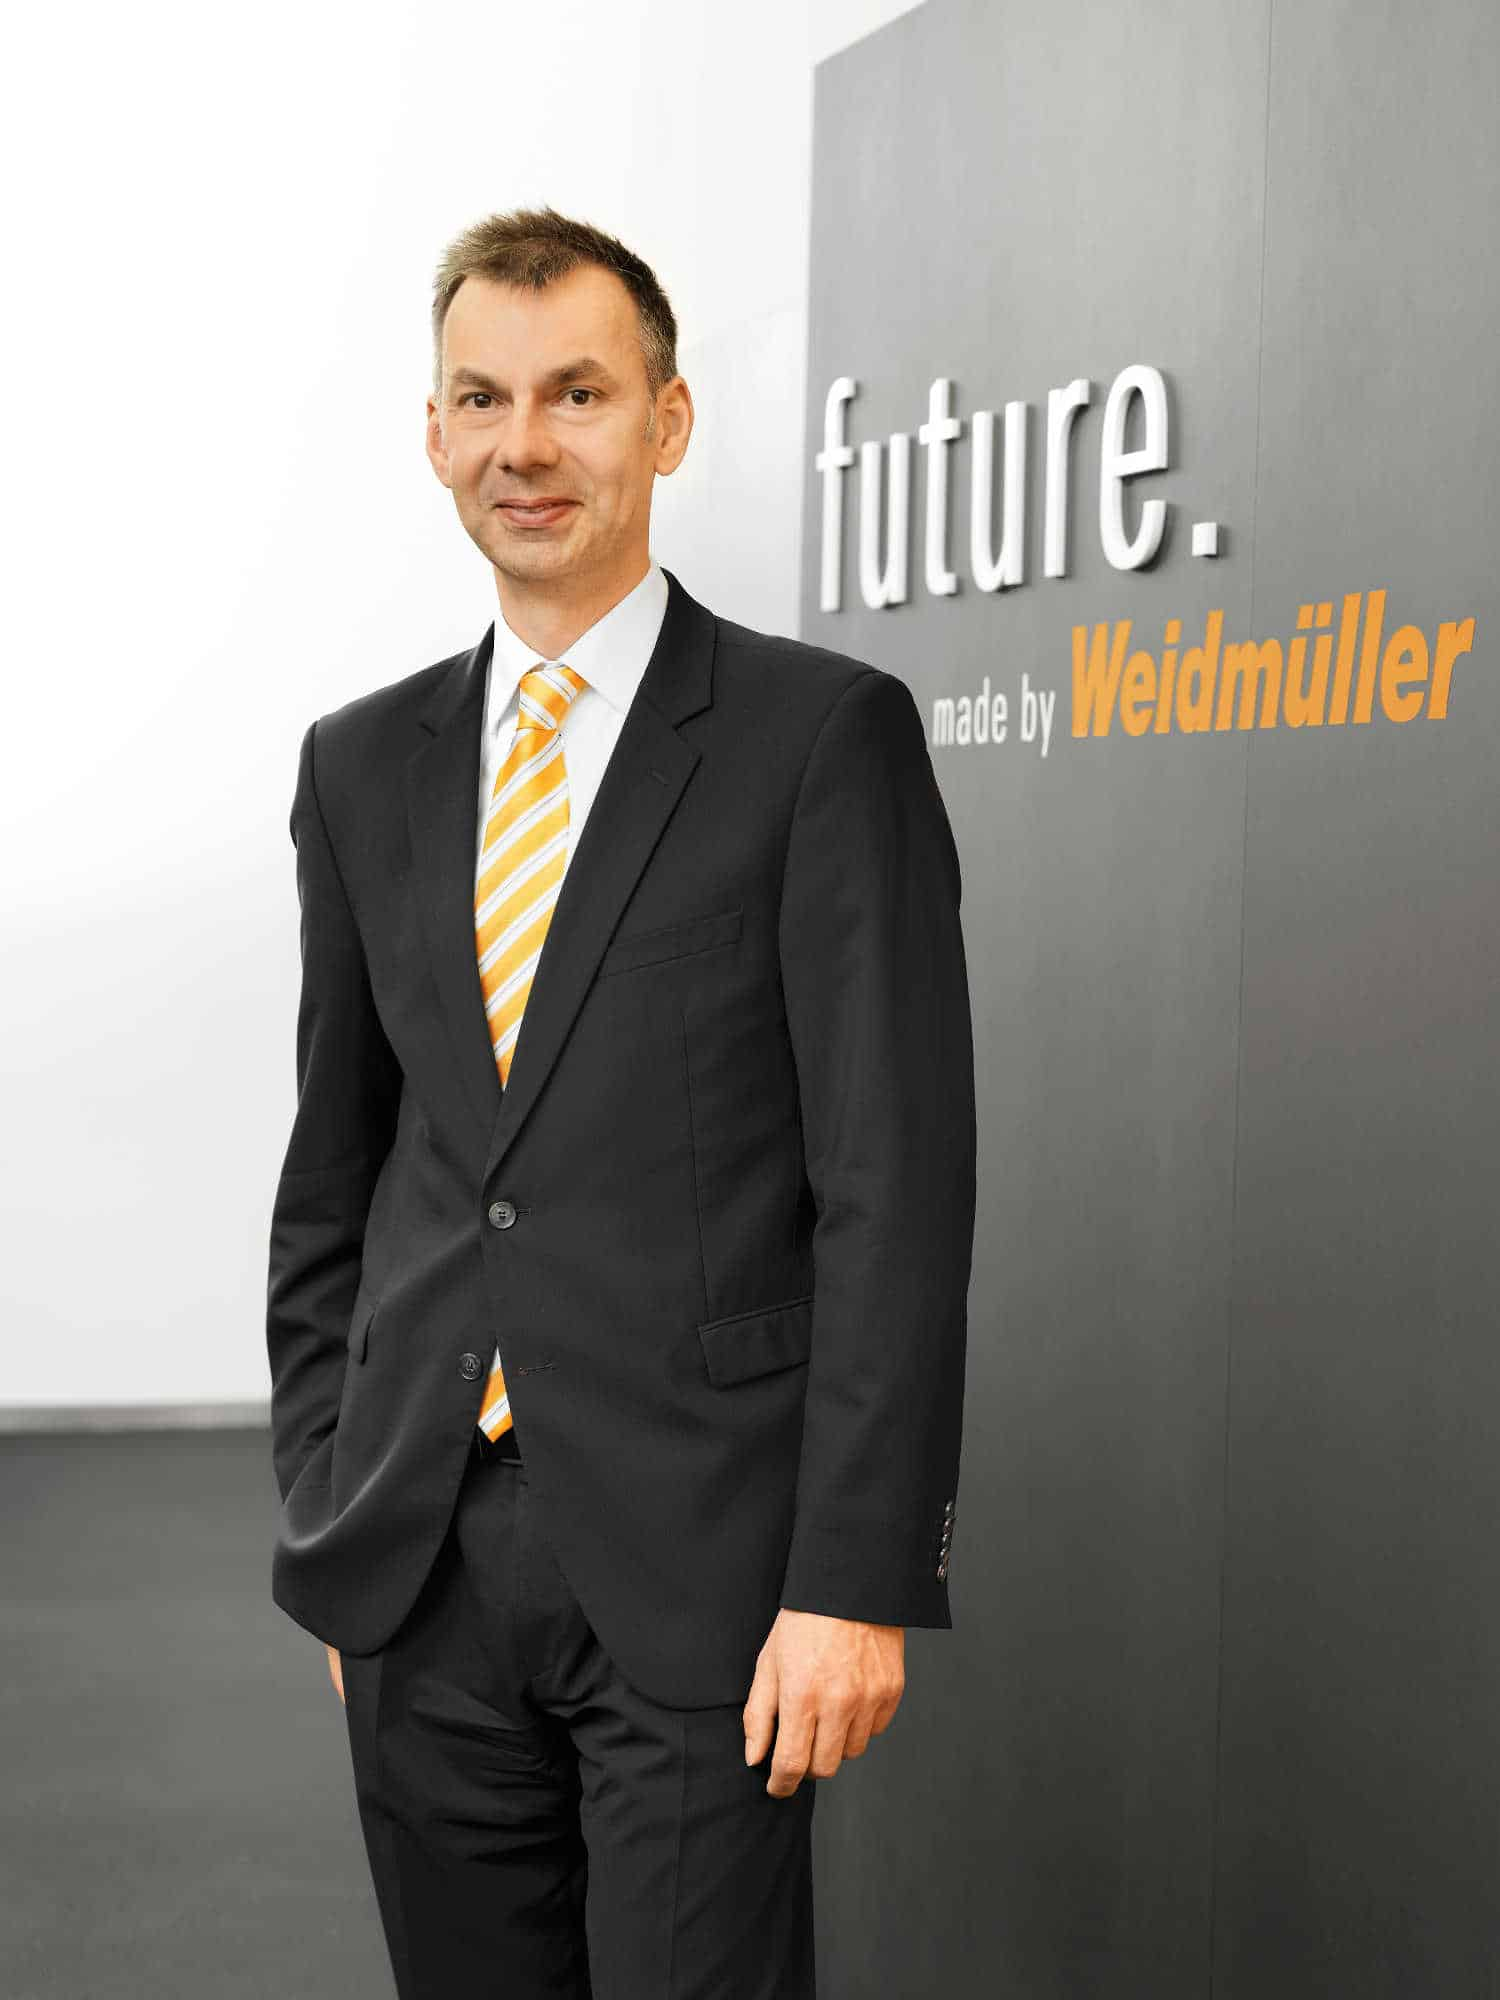 Übernimmt interimsmäßig: Josef Gross (Executive Vice President Sales and Marketing North and Eastern Europe) | Bild: Weidmüller